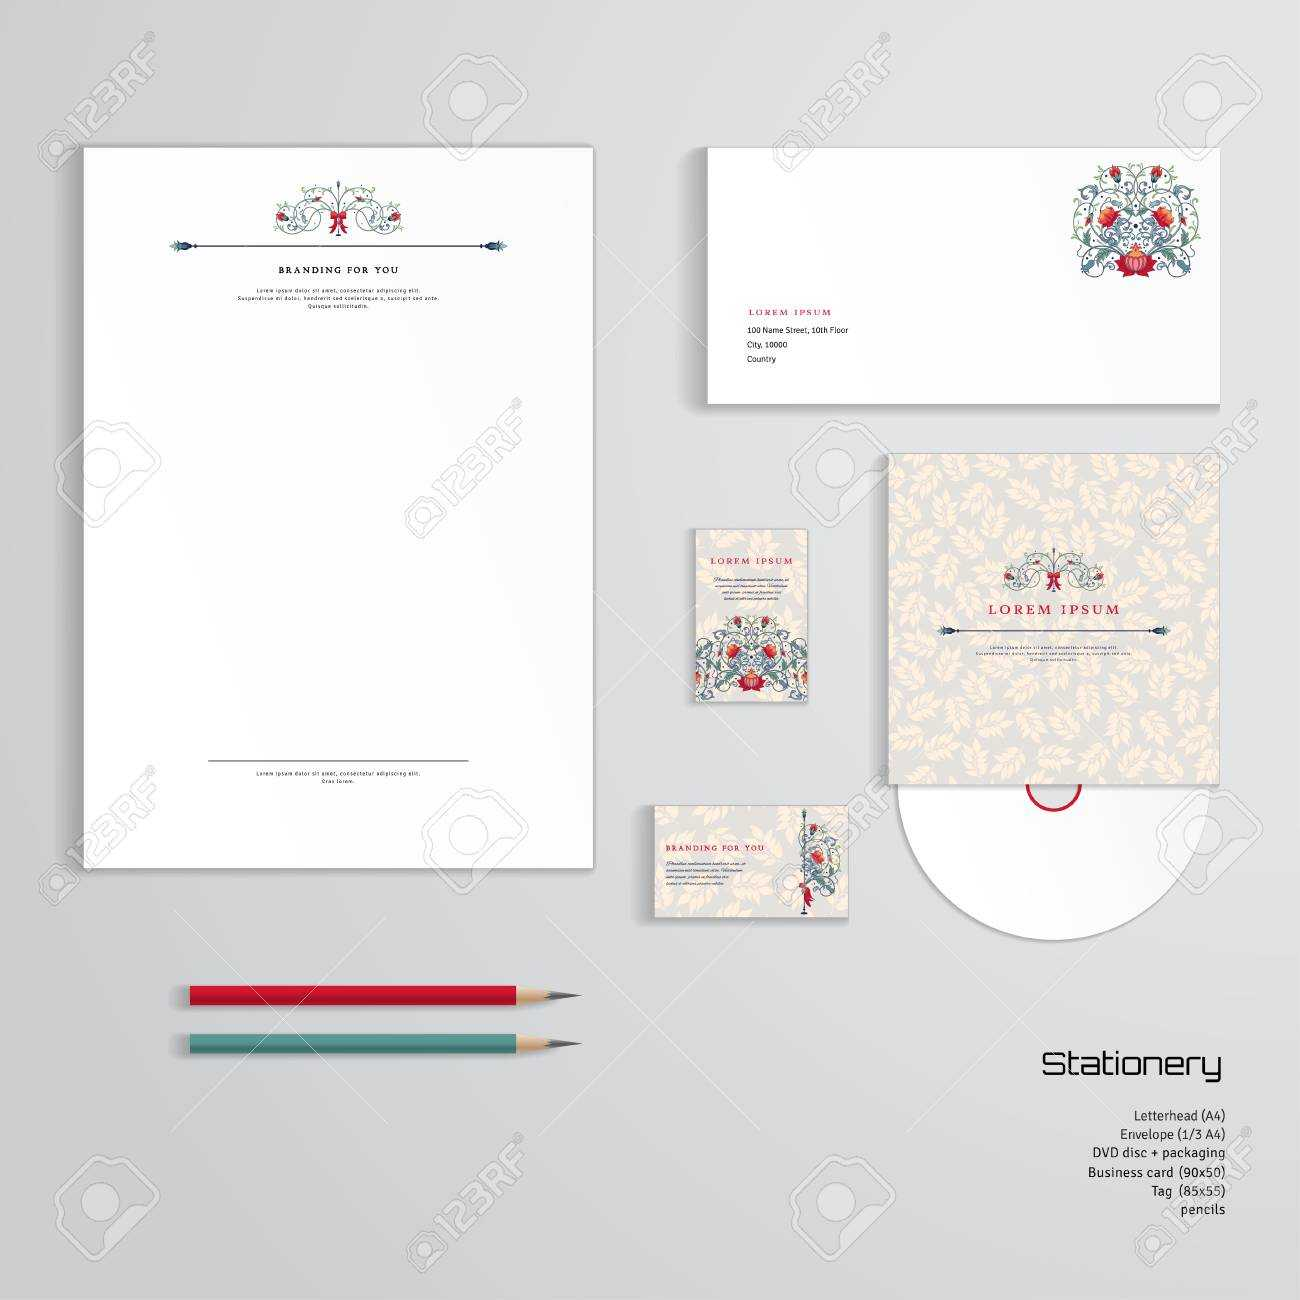 Vector Identity Templates. Letterhead, Envelope, Business Card,.. In Business Card Letterhead Envelope Template